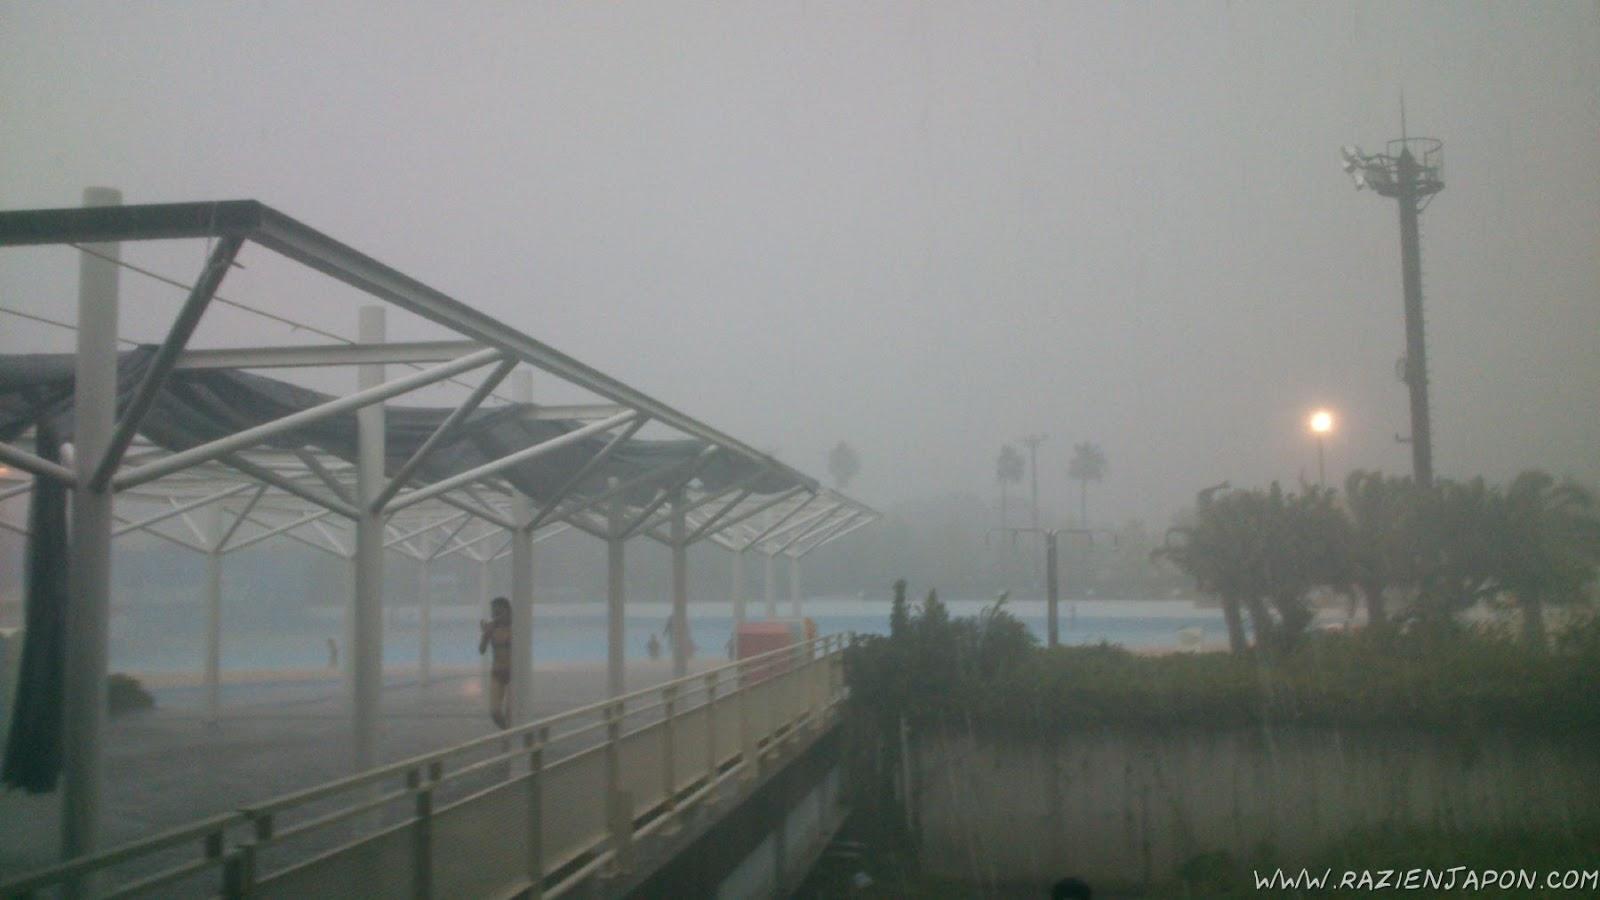 Super piscina en saitama un friki en jap n for Piscinas de monzon